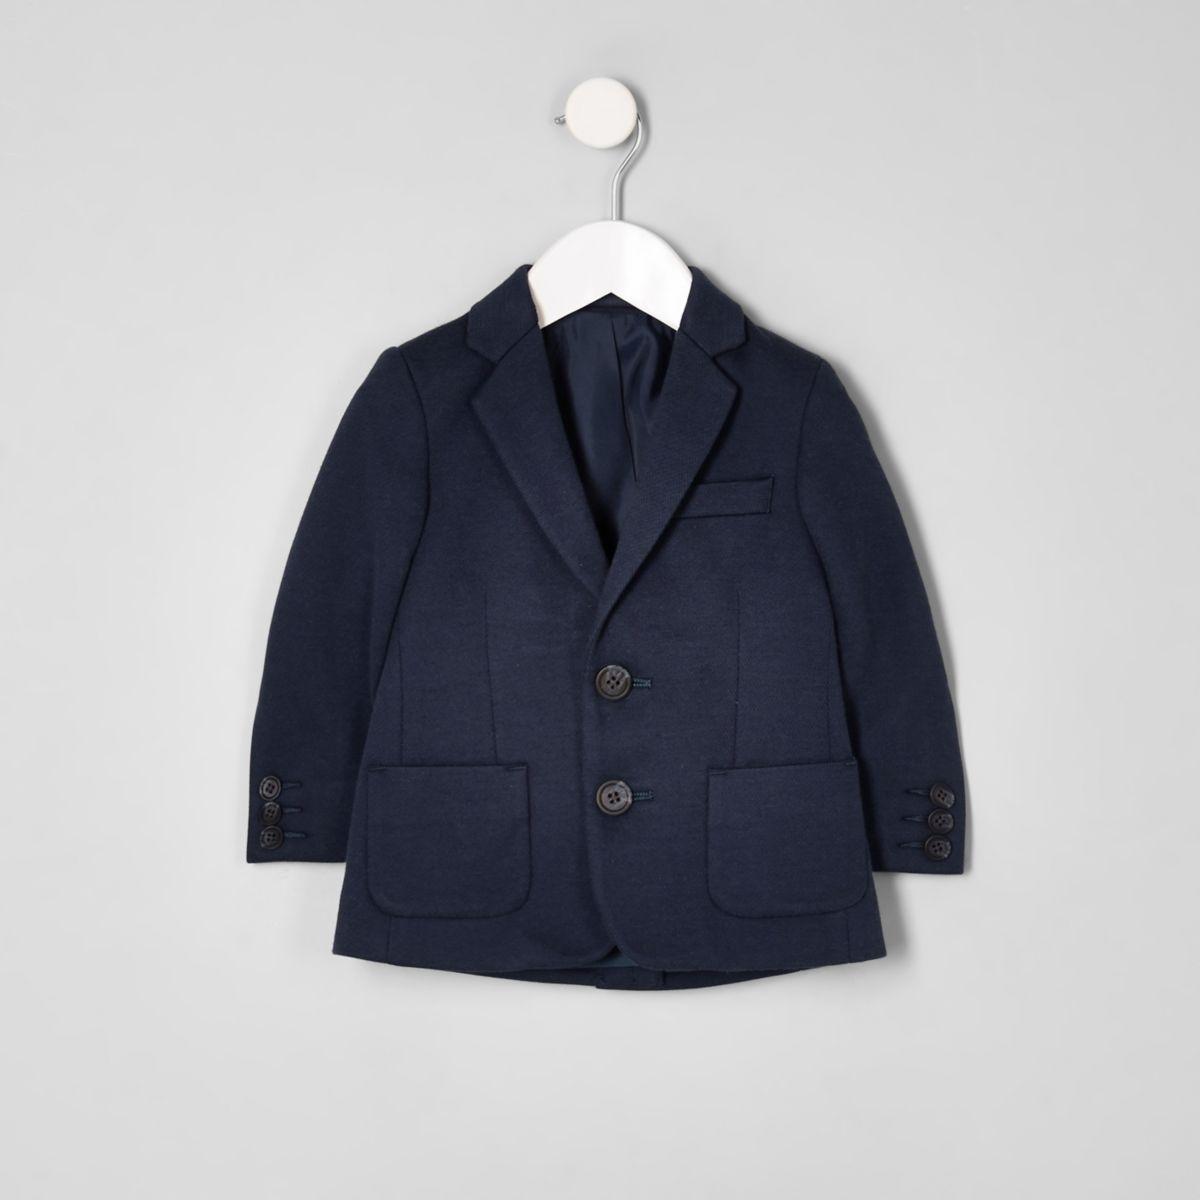 Mini boys navy jersey blazer